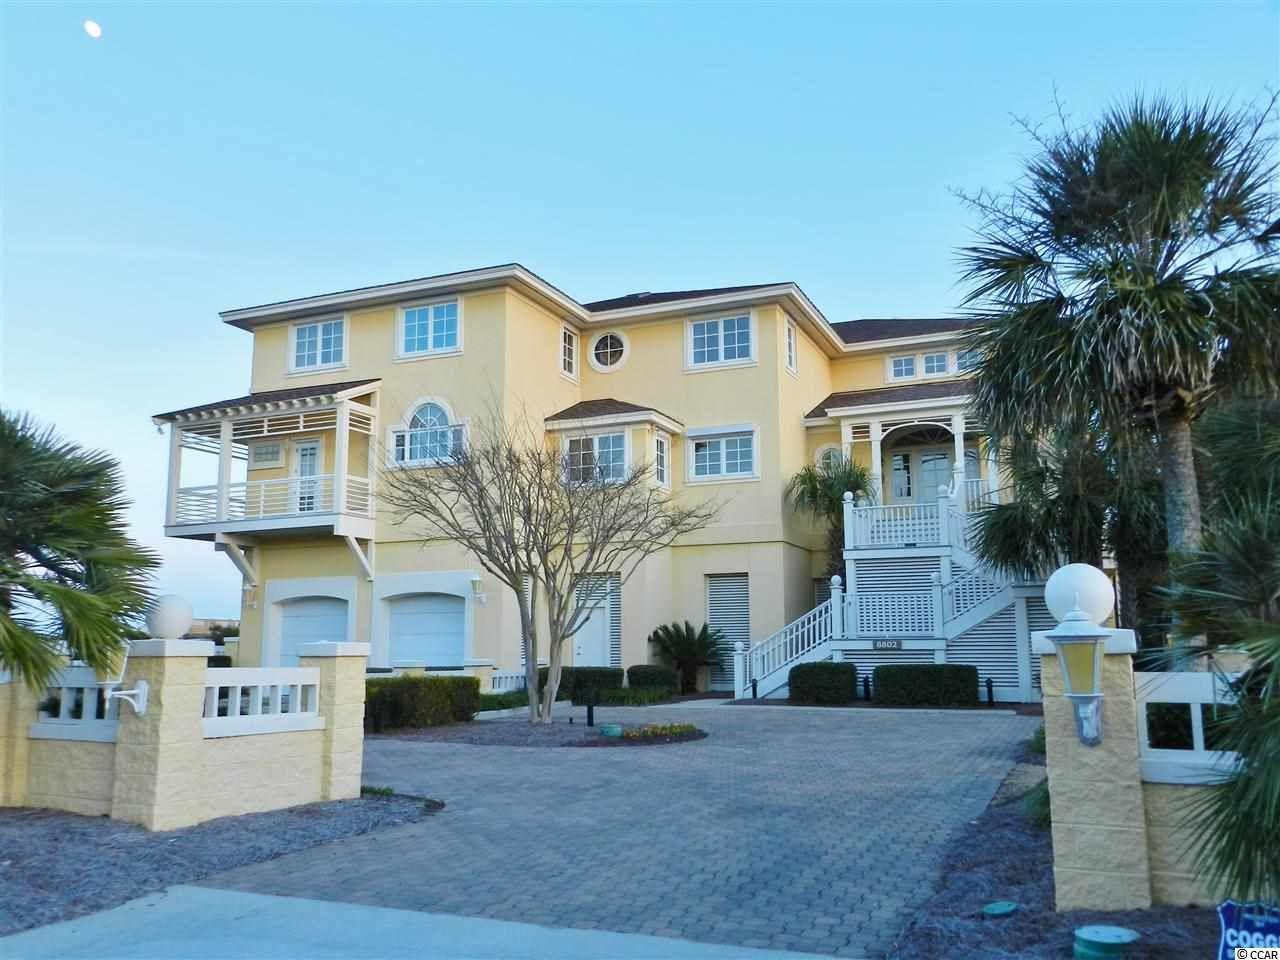 8802 N Ocean Blvd Myrtle Beach Sc 29572 Mls 1312637 Is For Sale Ace Realty Myrtle Beach Real Estate Myrtle Beach Condos Condos For Sale